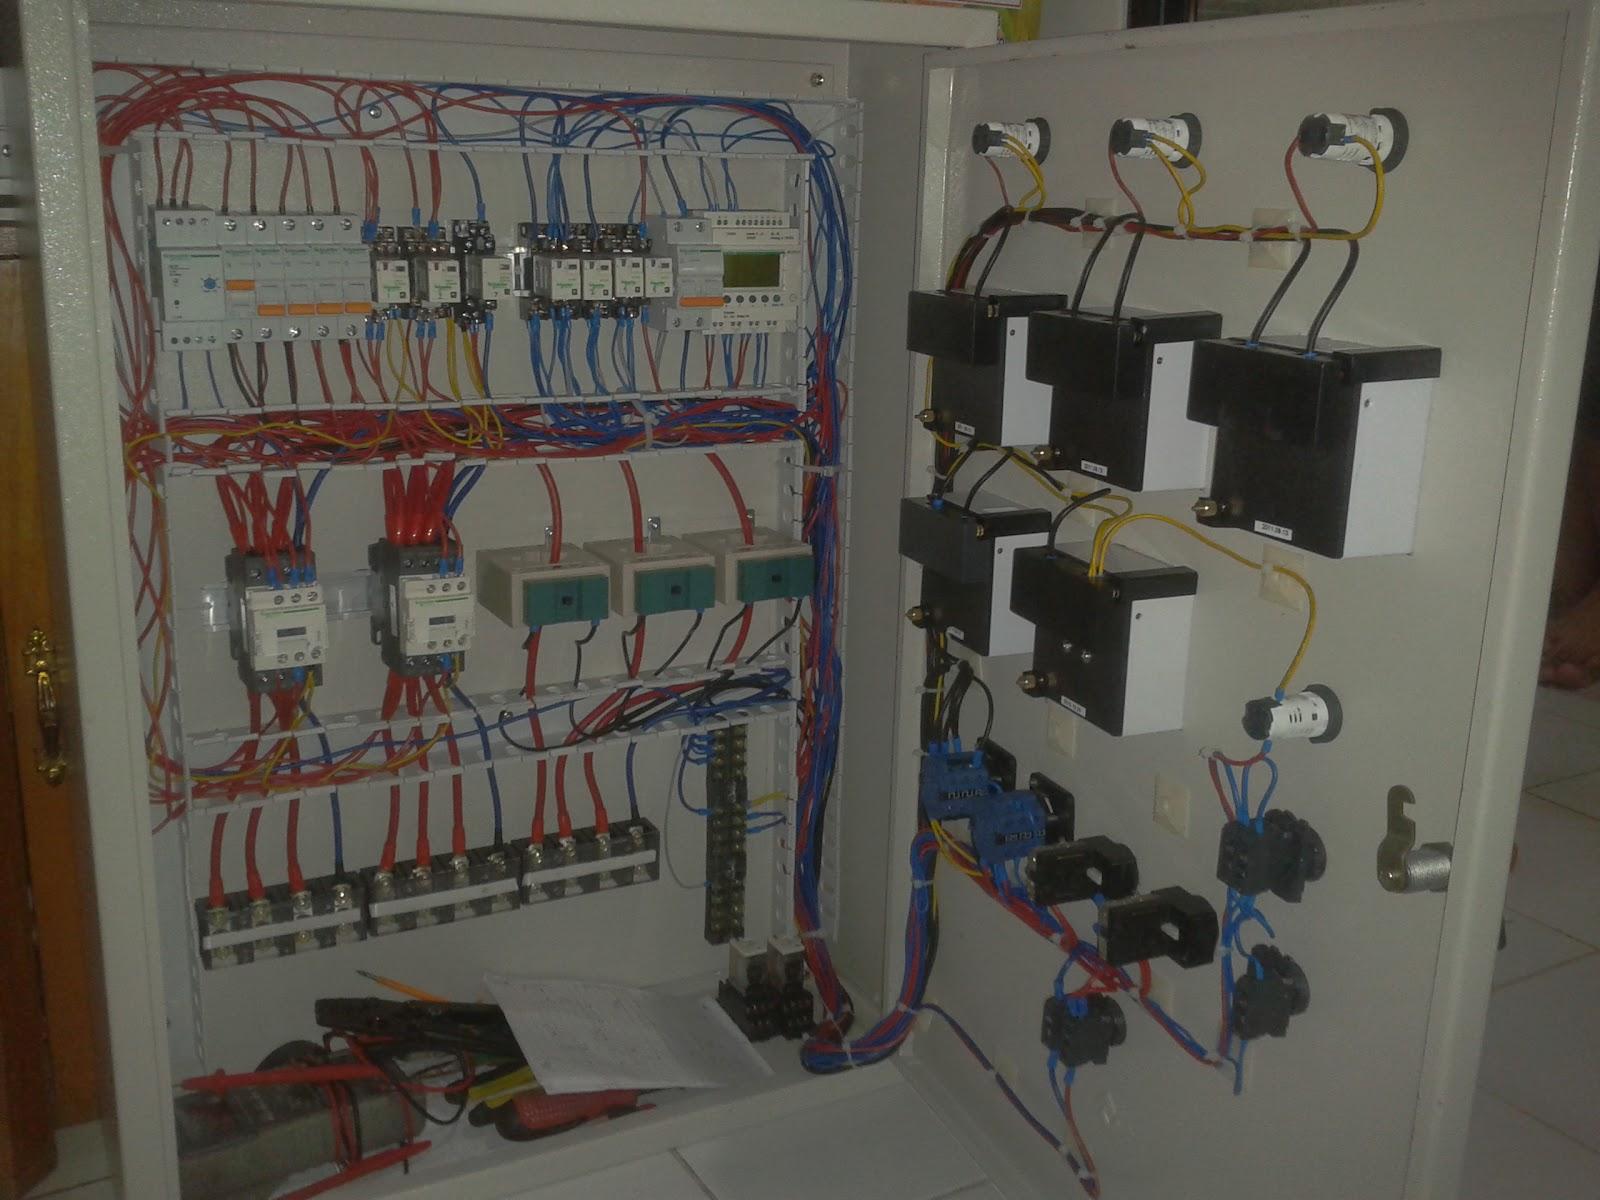 Jasa kelistrikan makassar electrical support indonesia lokasi proyek kantor dprd enrekang jadwal juni 2012 kegunaan transfer automatis antara listrik dari pln ke genset ccuart Choice Image